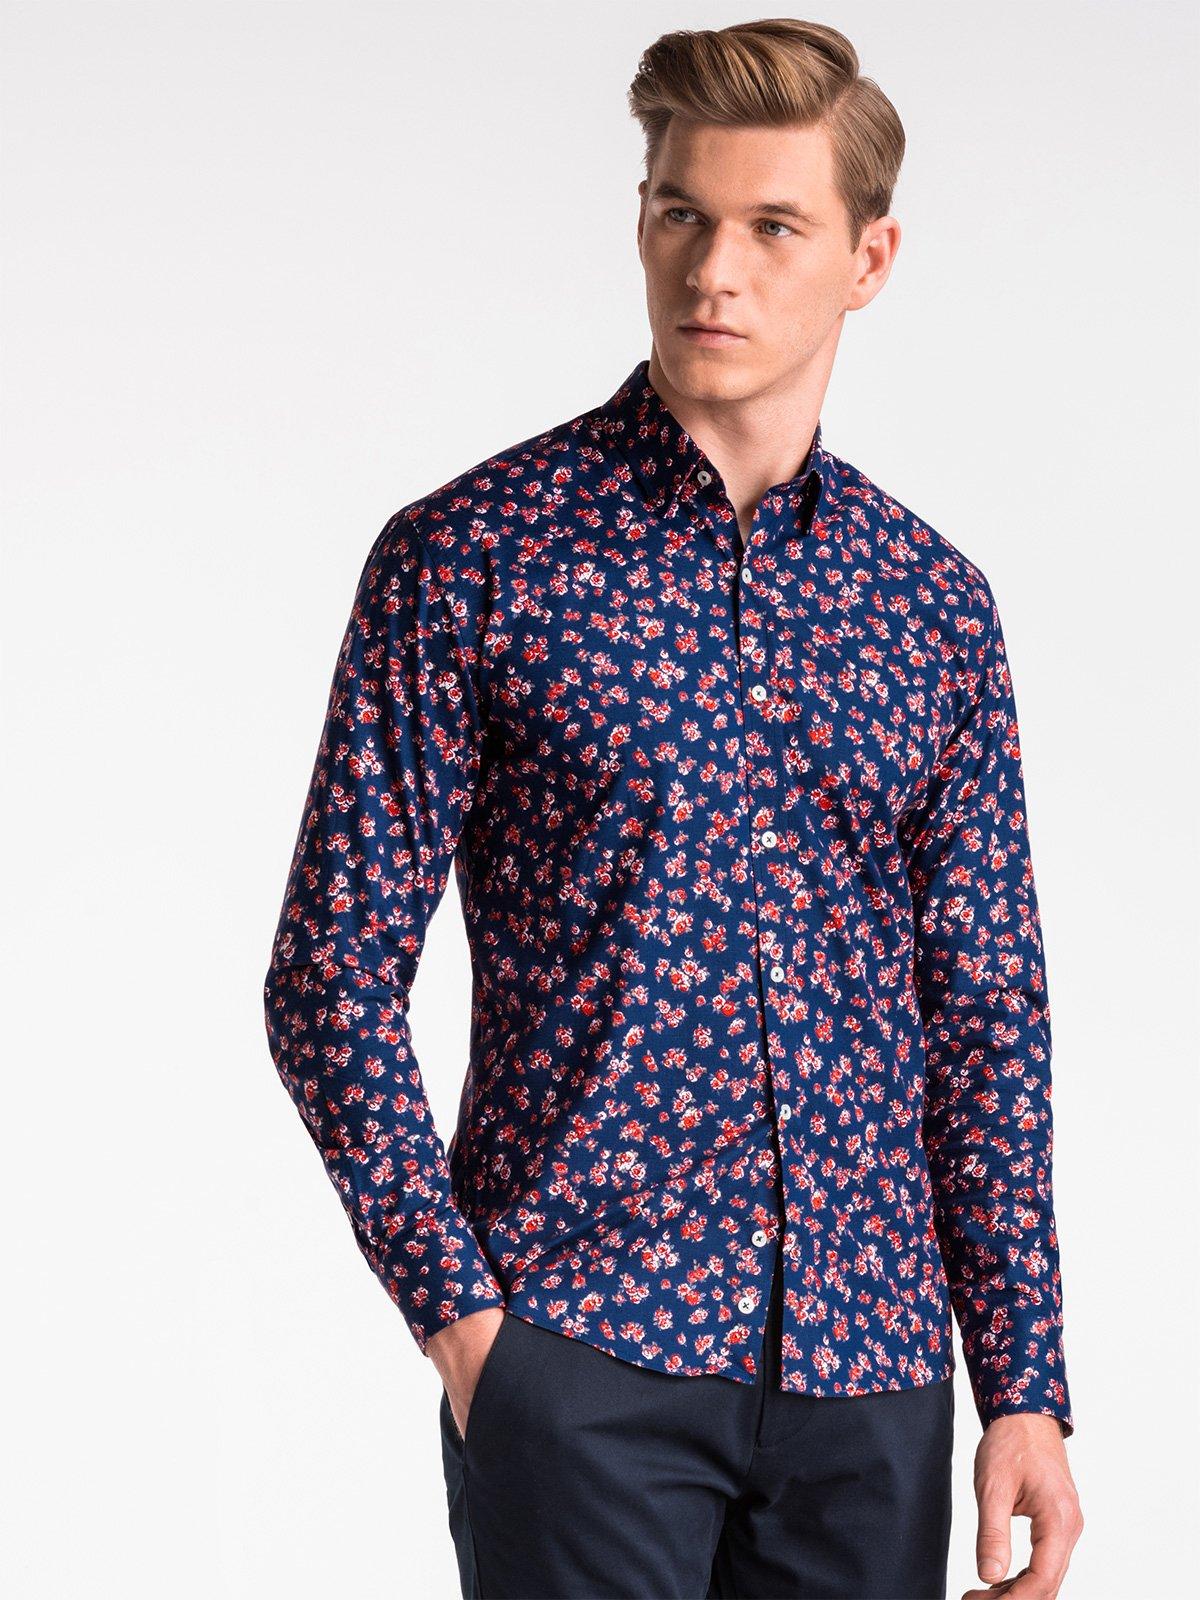 Купить со скидкой Сорочка чоловіча елегантна з довгим рукавом K501 – темно-синя/червона